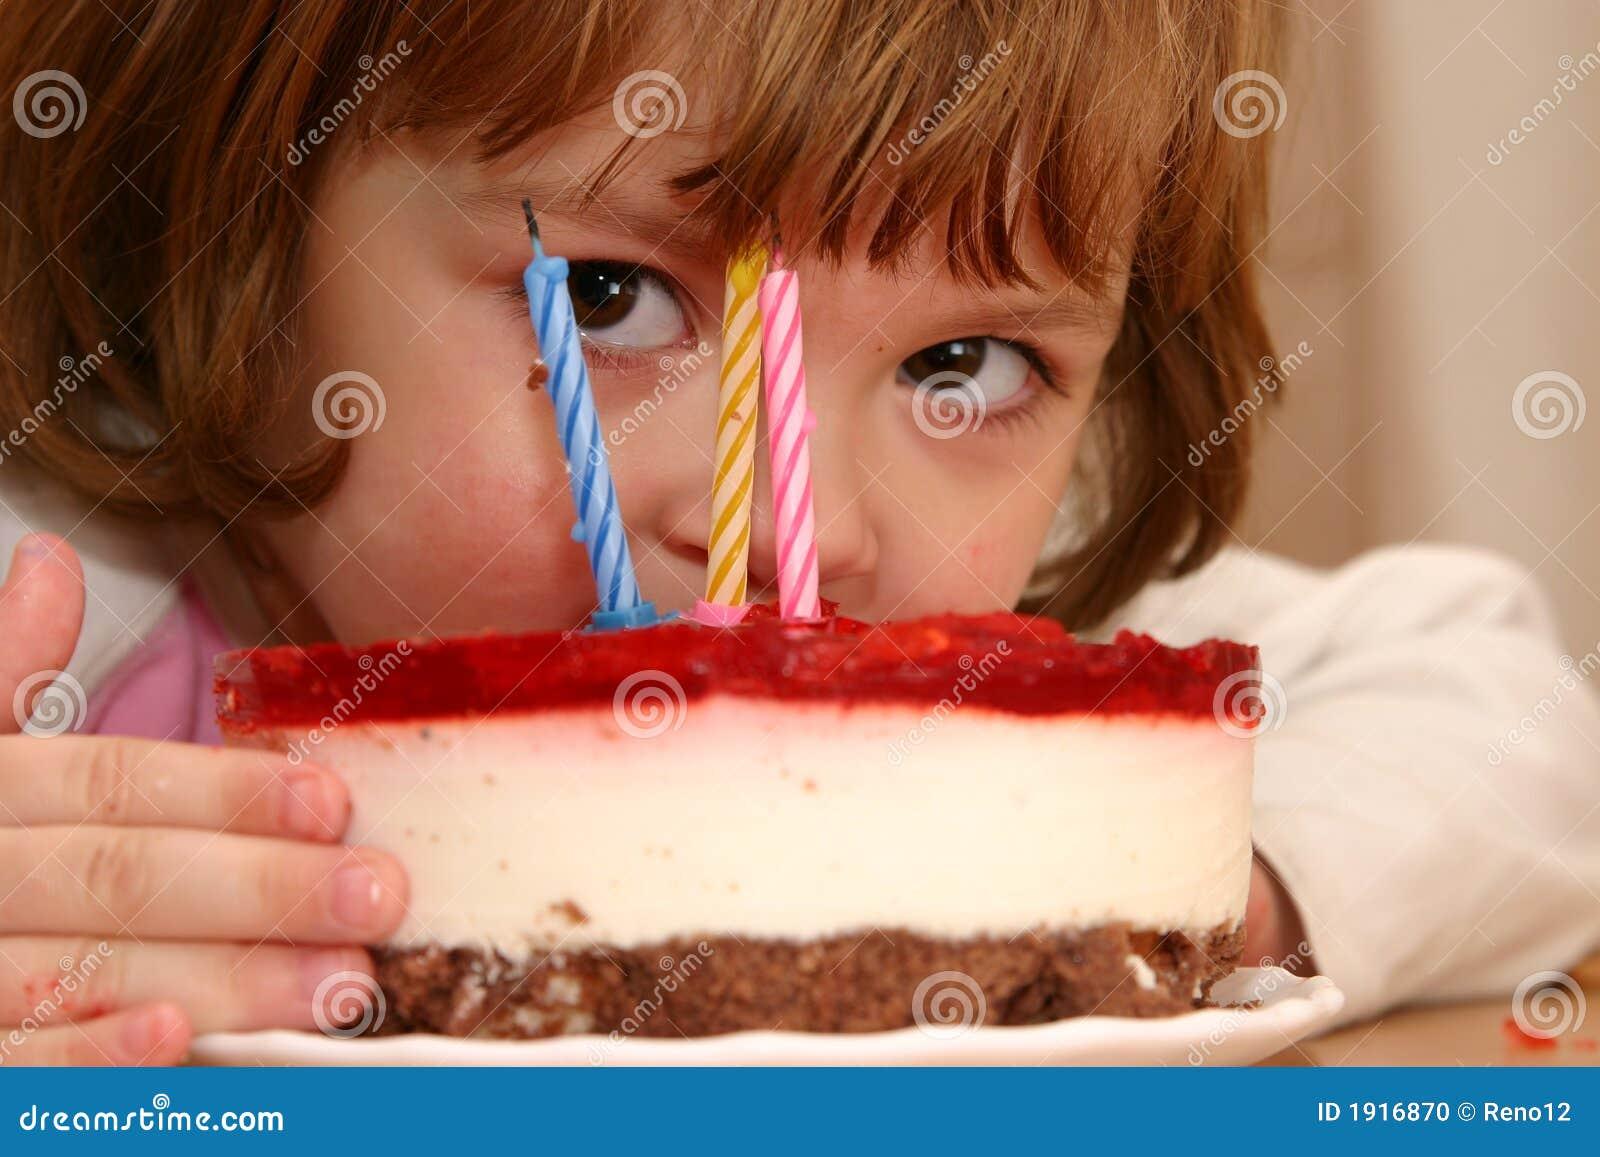 Eating My Birthday Cake Stock Photo Image 1916870